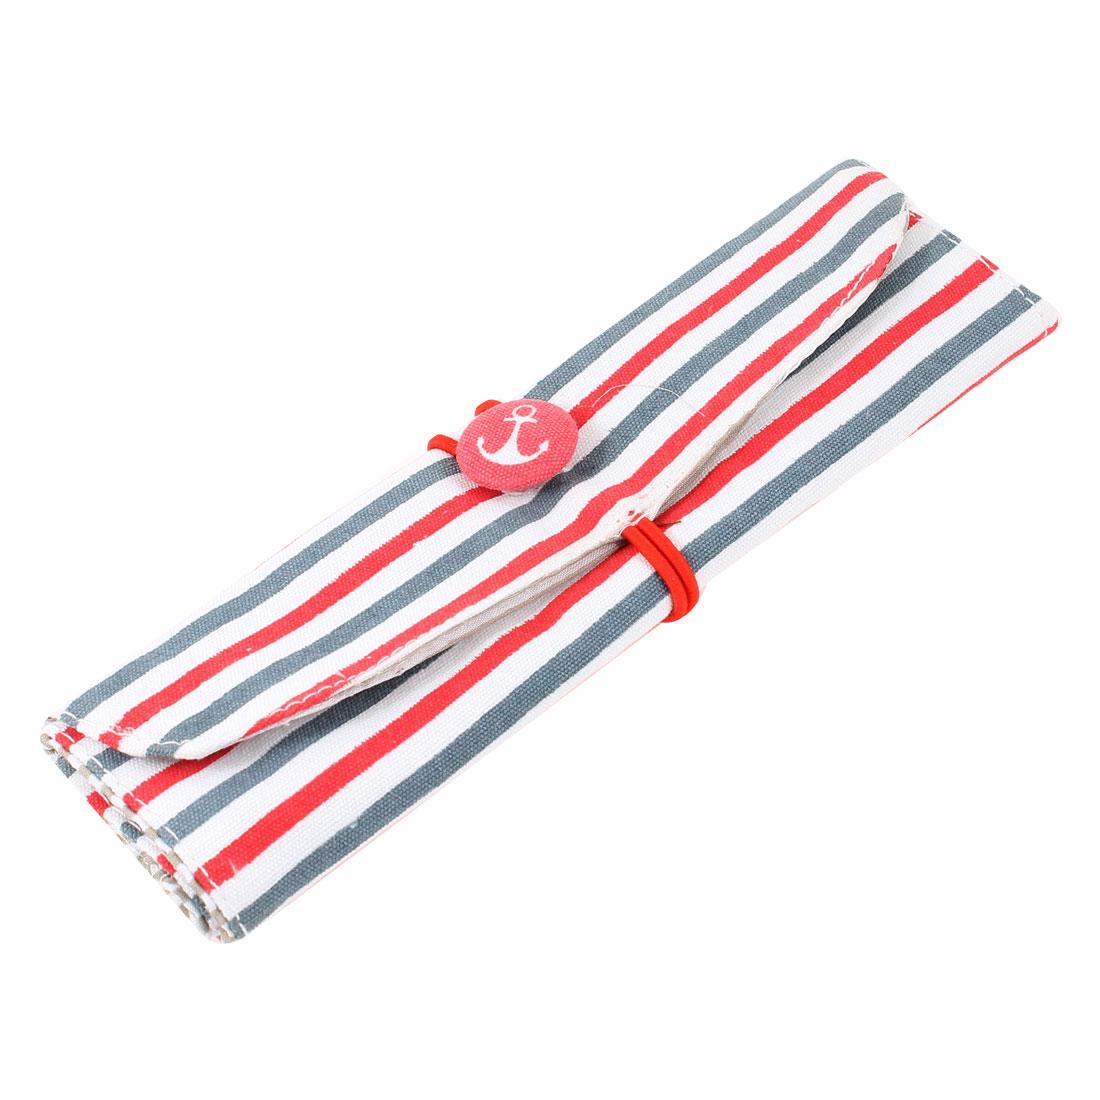 Student Stationery Stripe Printed Foldable Pen Ruler Holder Bag Red White Green